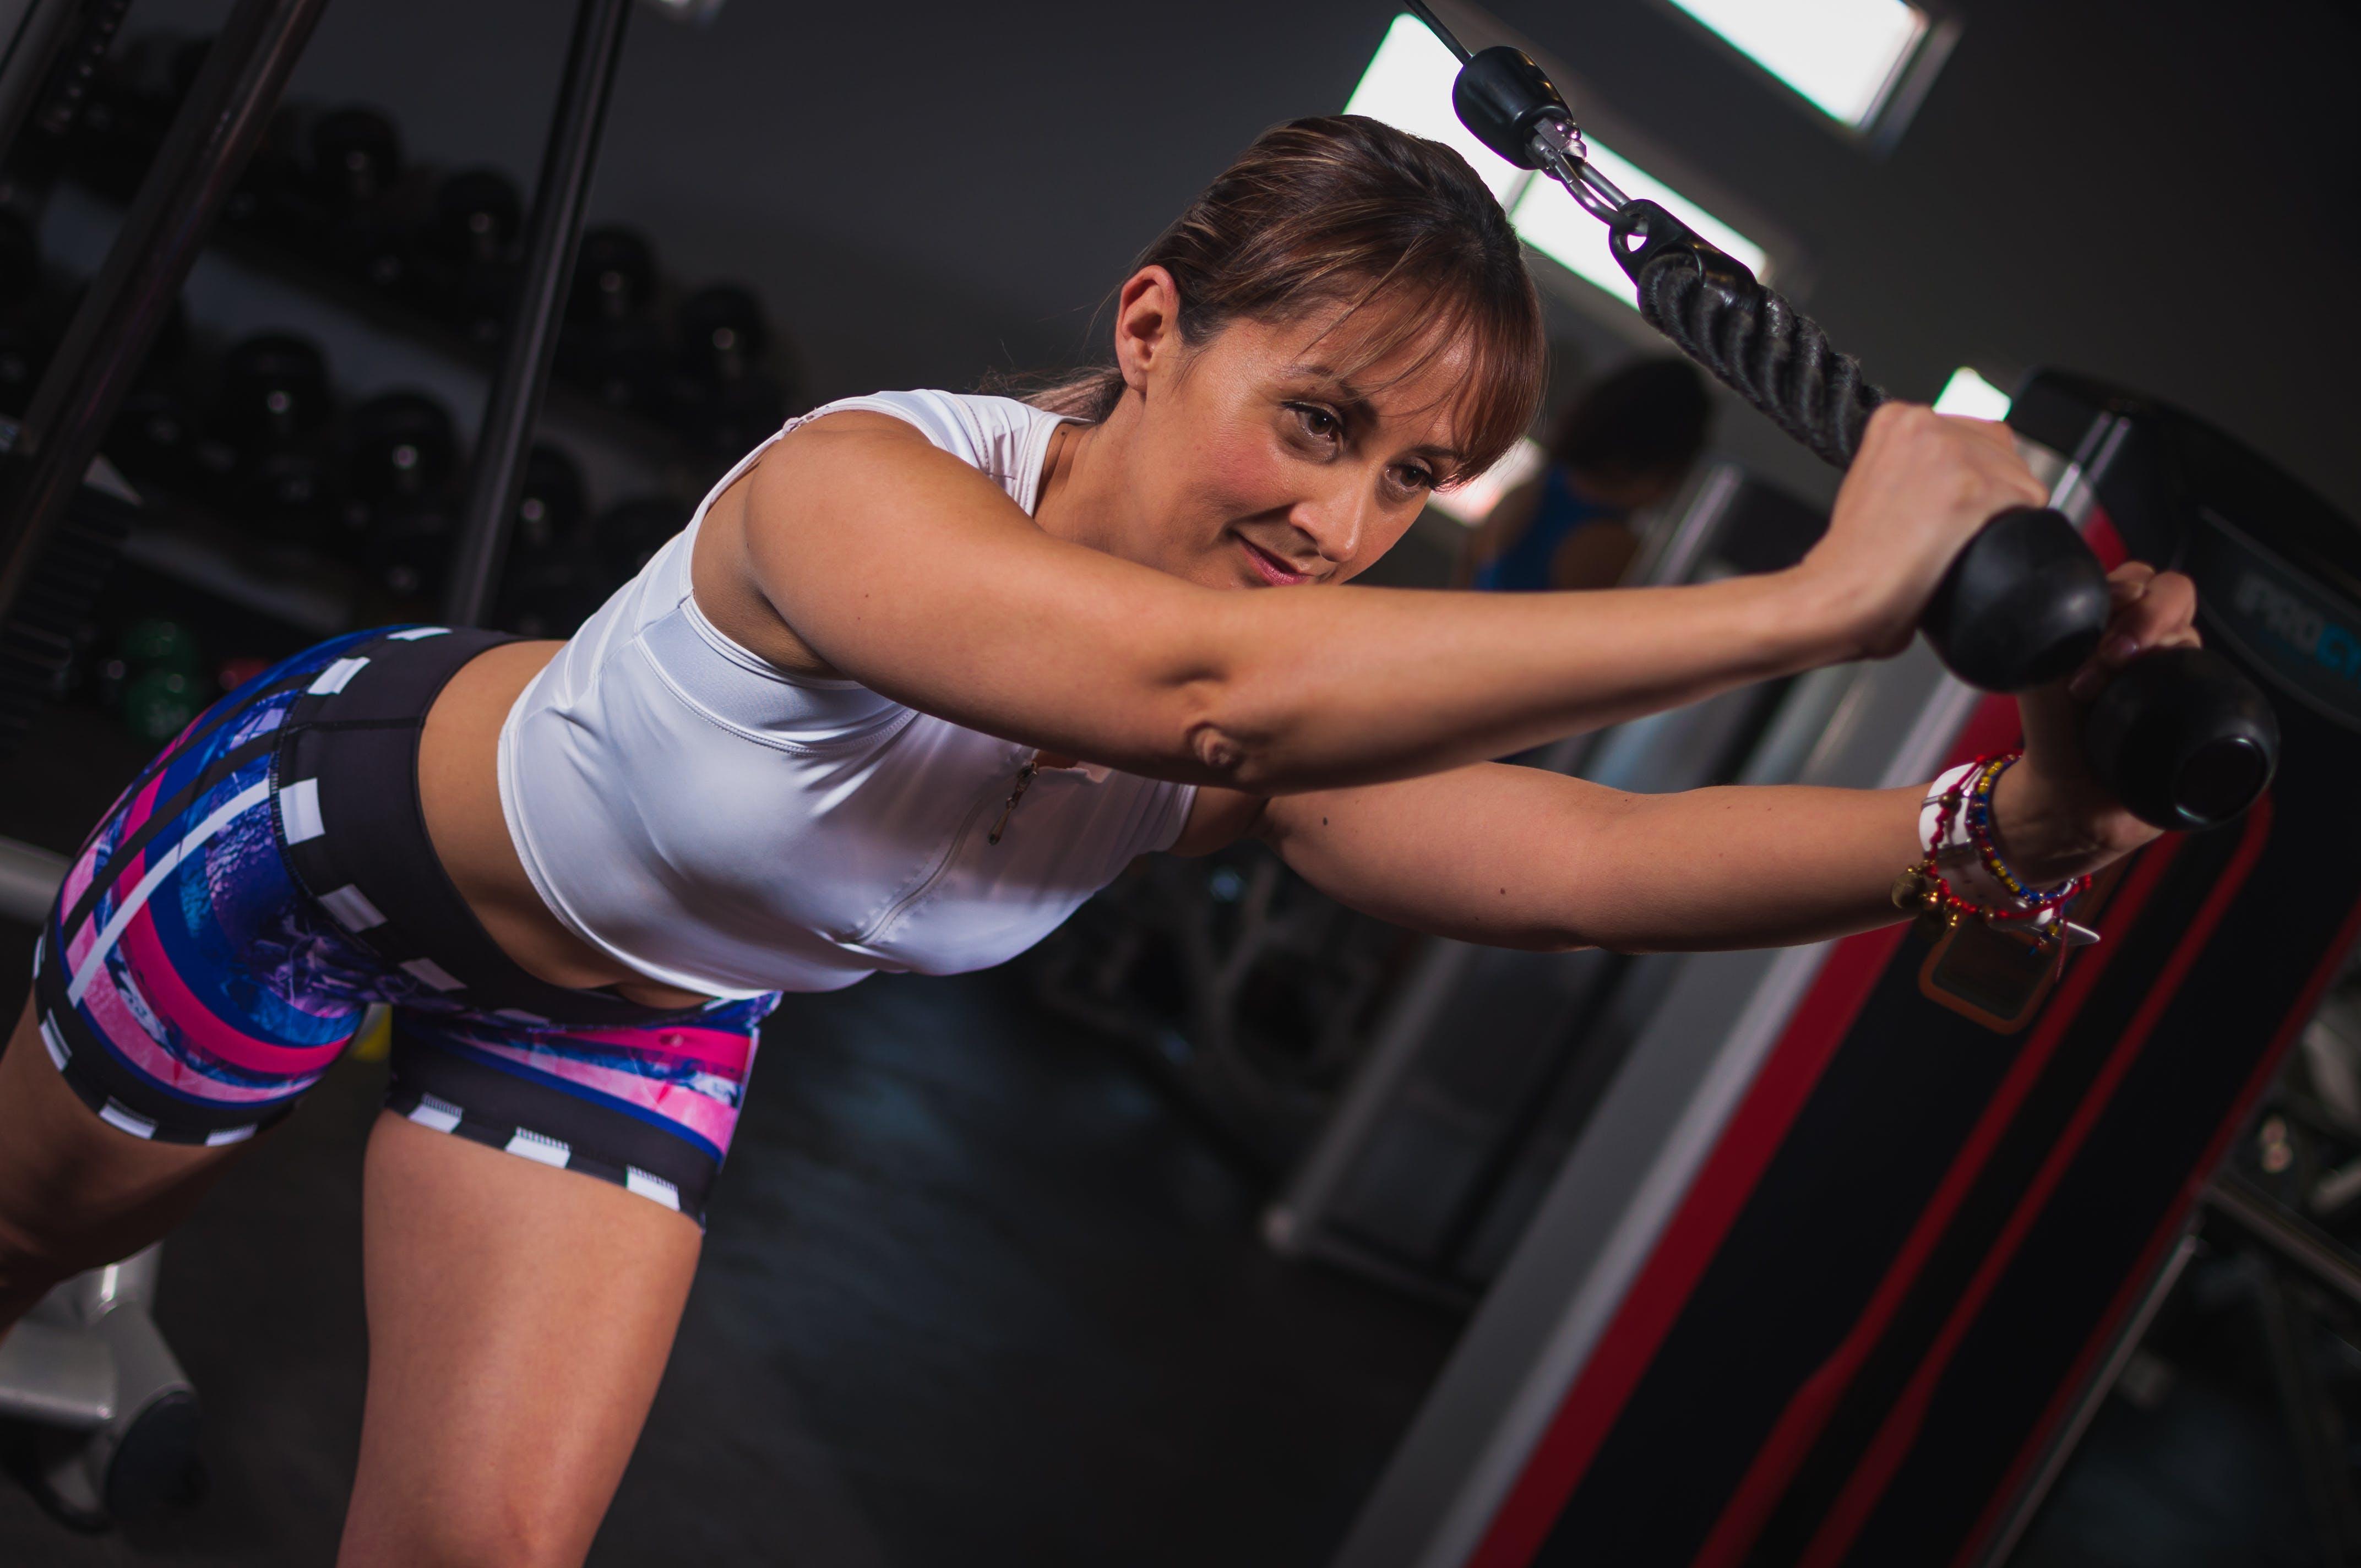 Free stock photo of beauty, fitness, fitness model, hot